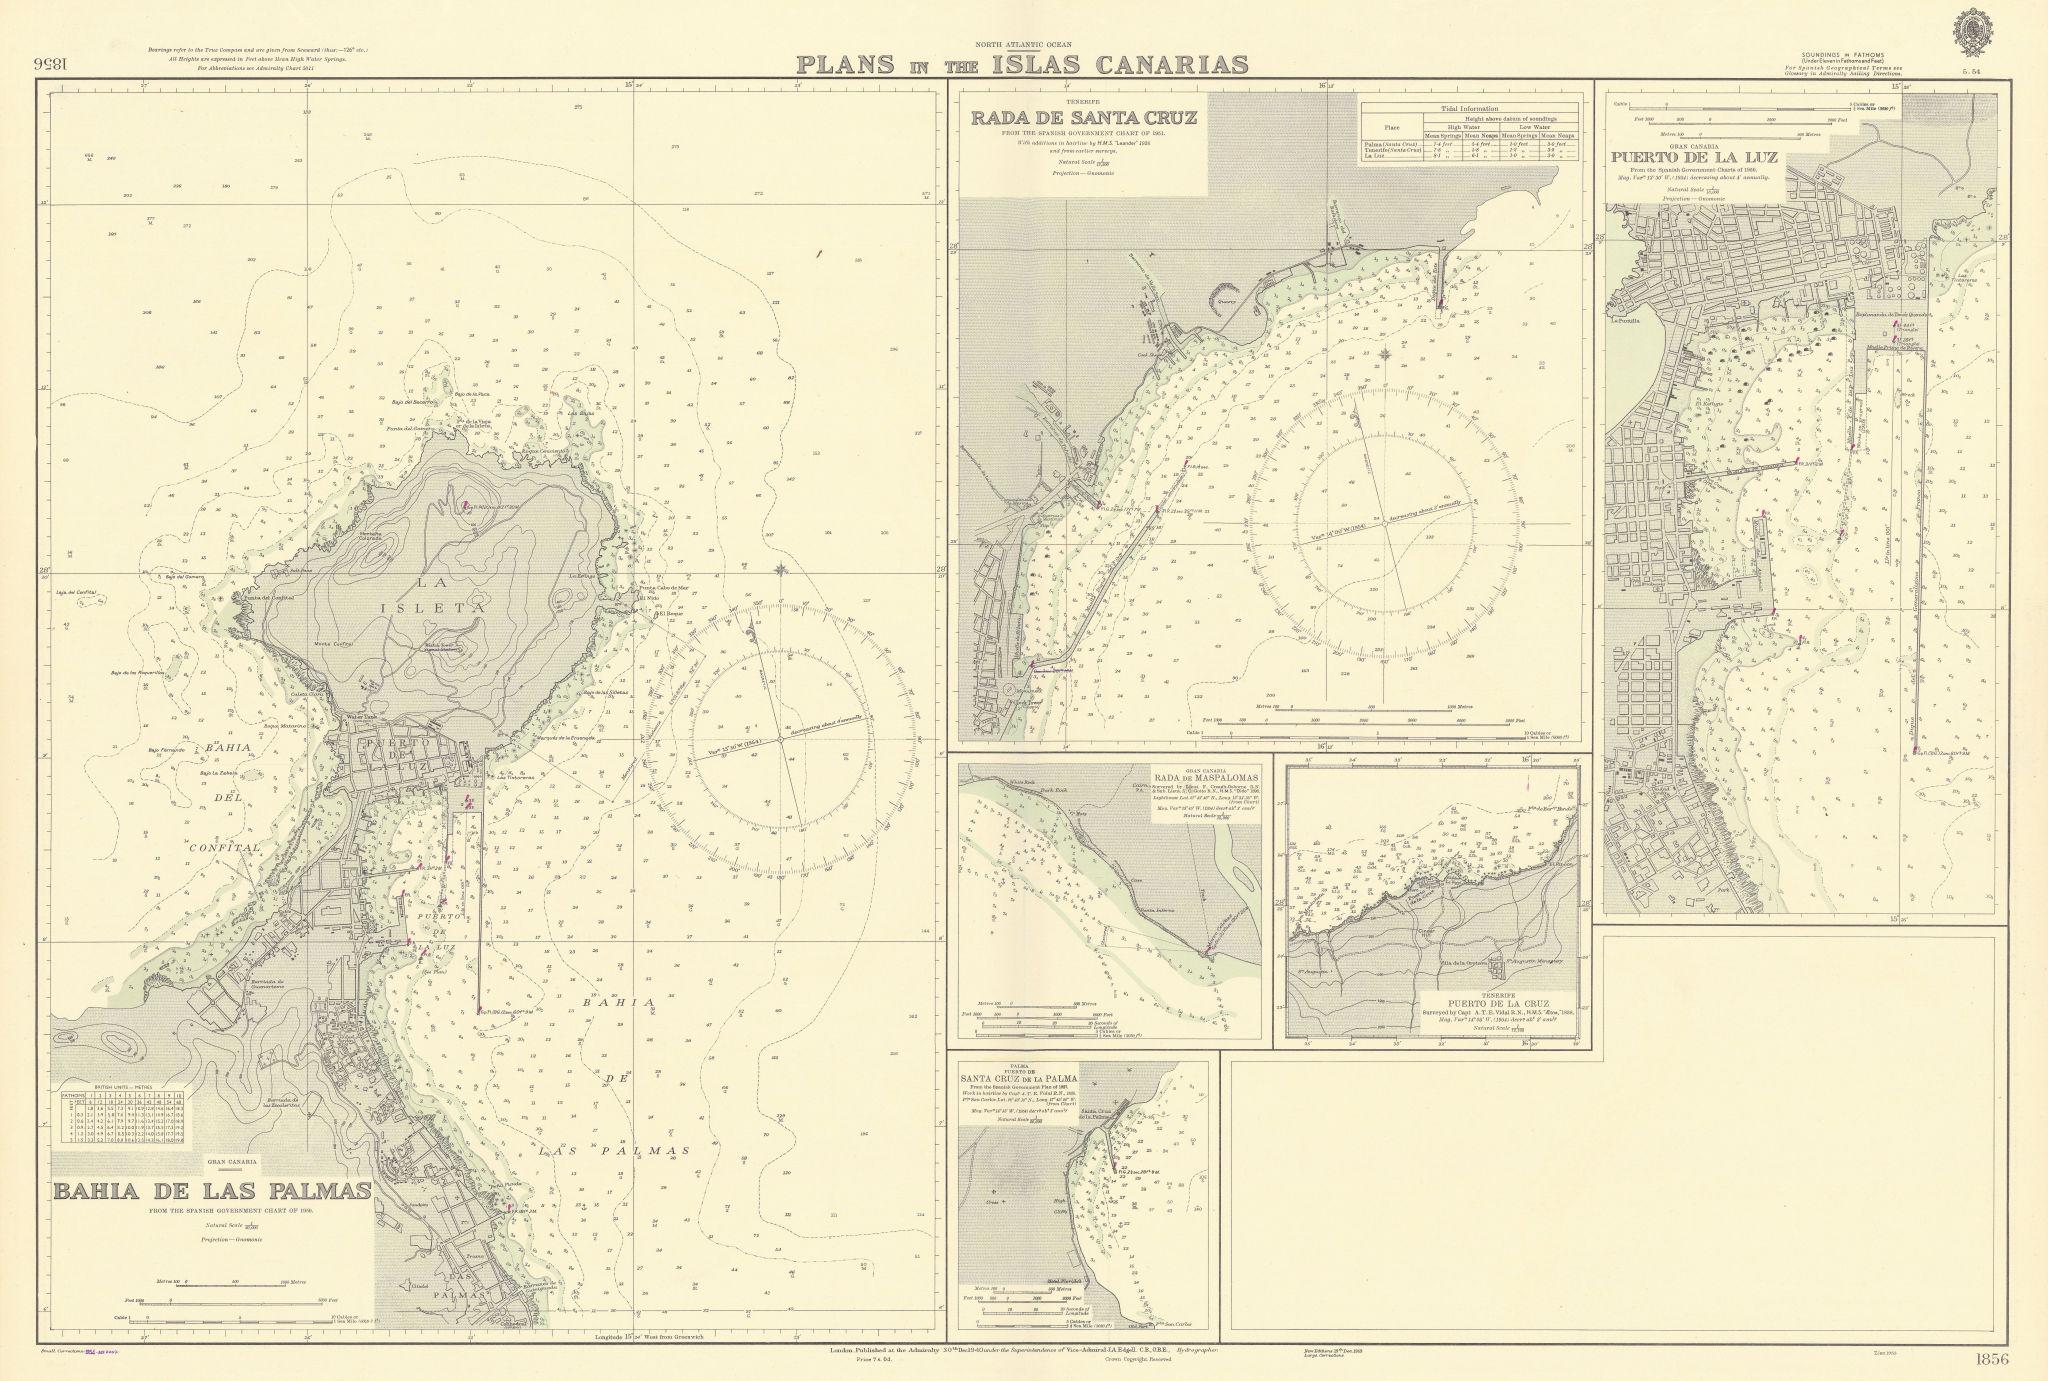 Canary Islands ports Tenerife Gran Canaria Palma ADMIRALTY chart 1940 (1954) map